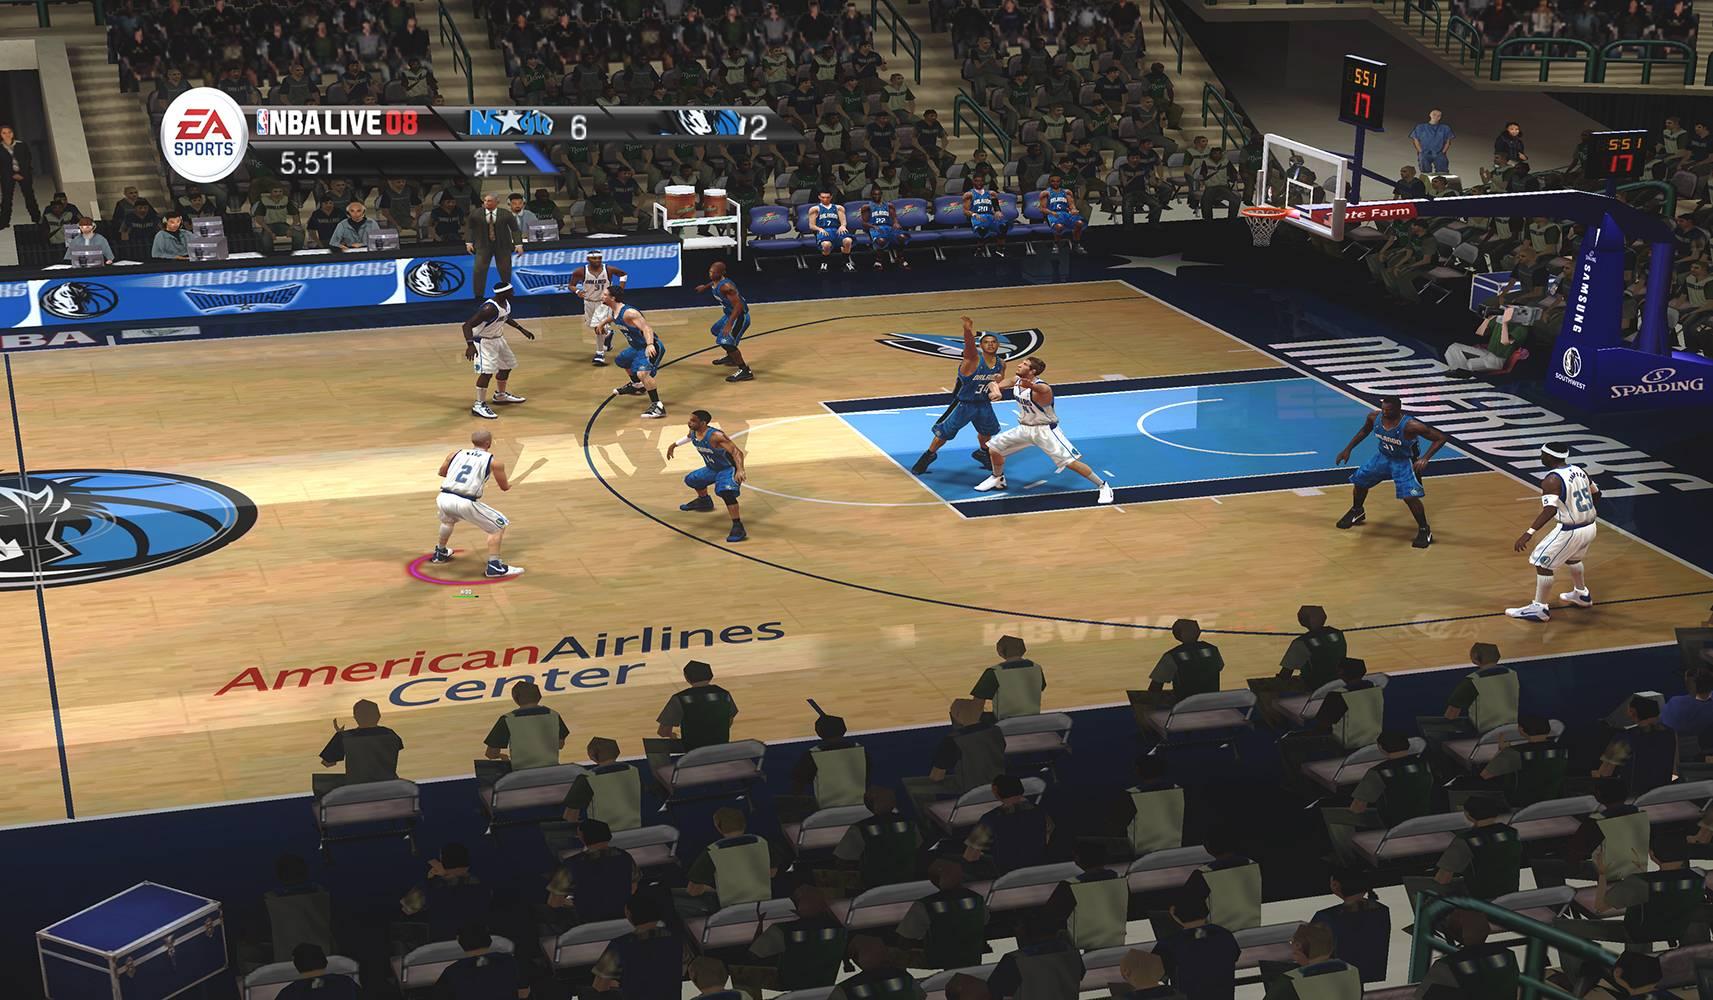 NBA LIVE 08【4K】-2021-03-22-02-14-47-074副本.jpg